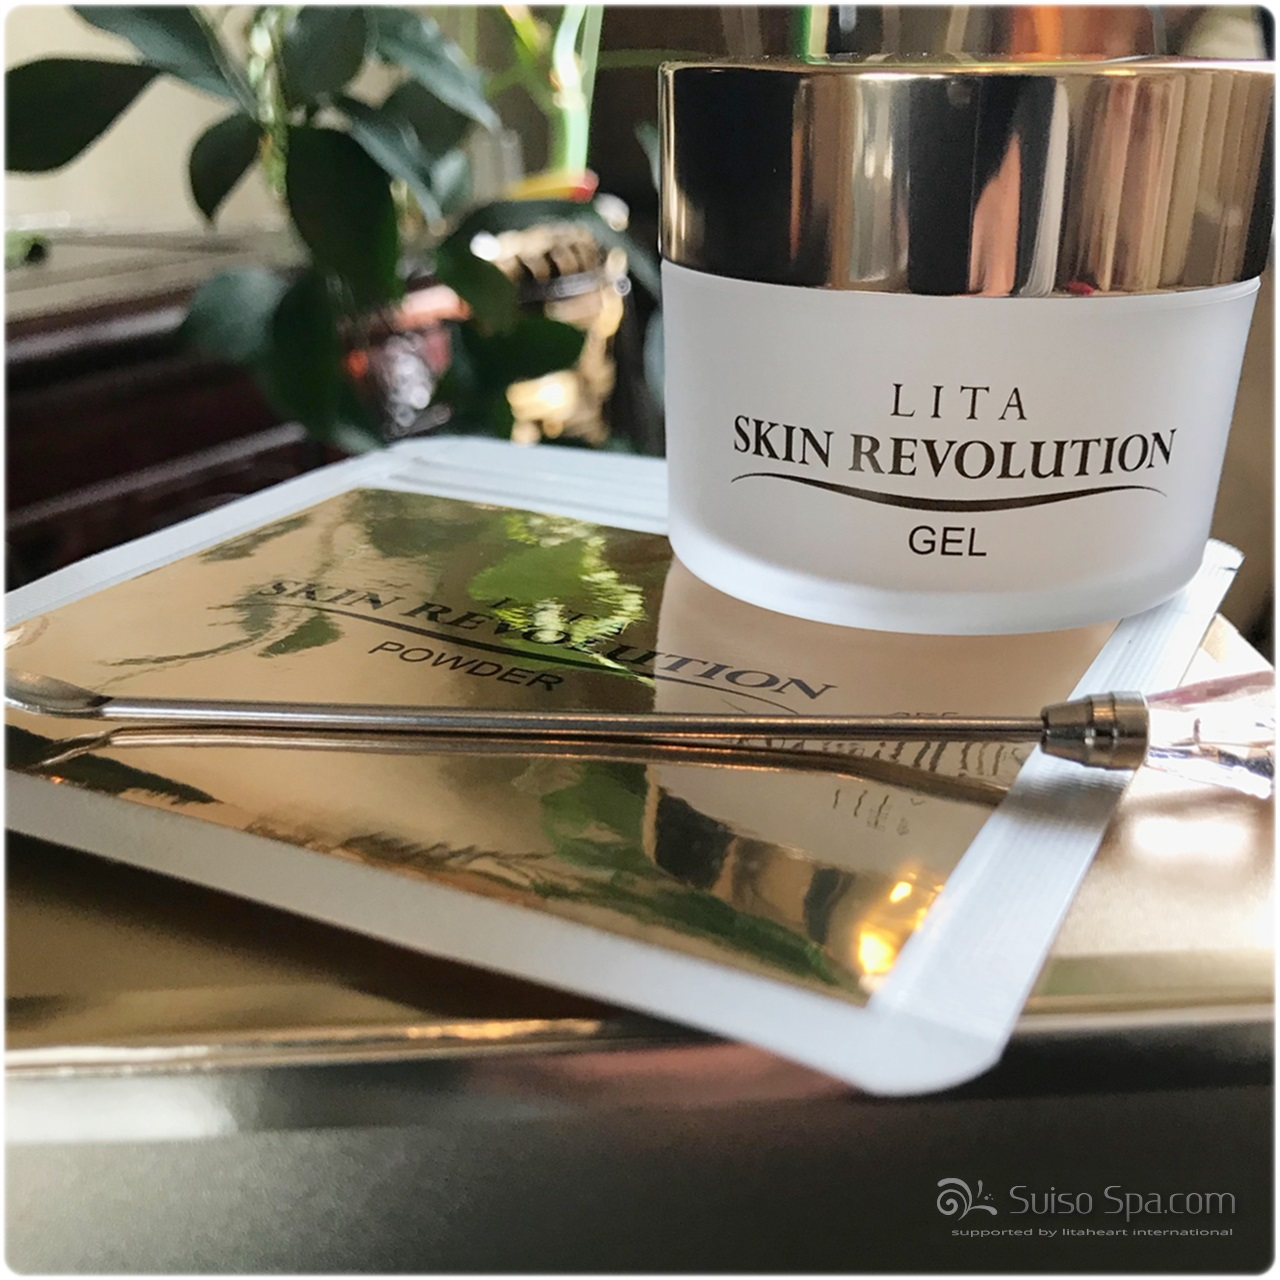 LITA SKIN REVOLUTION GEL